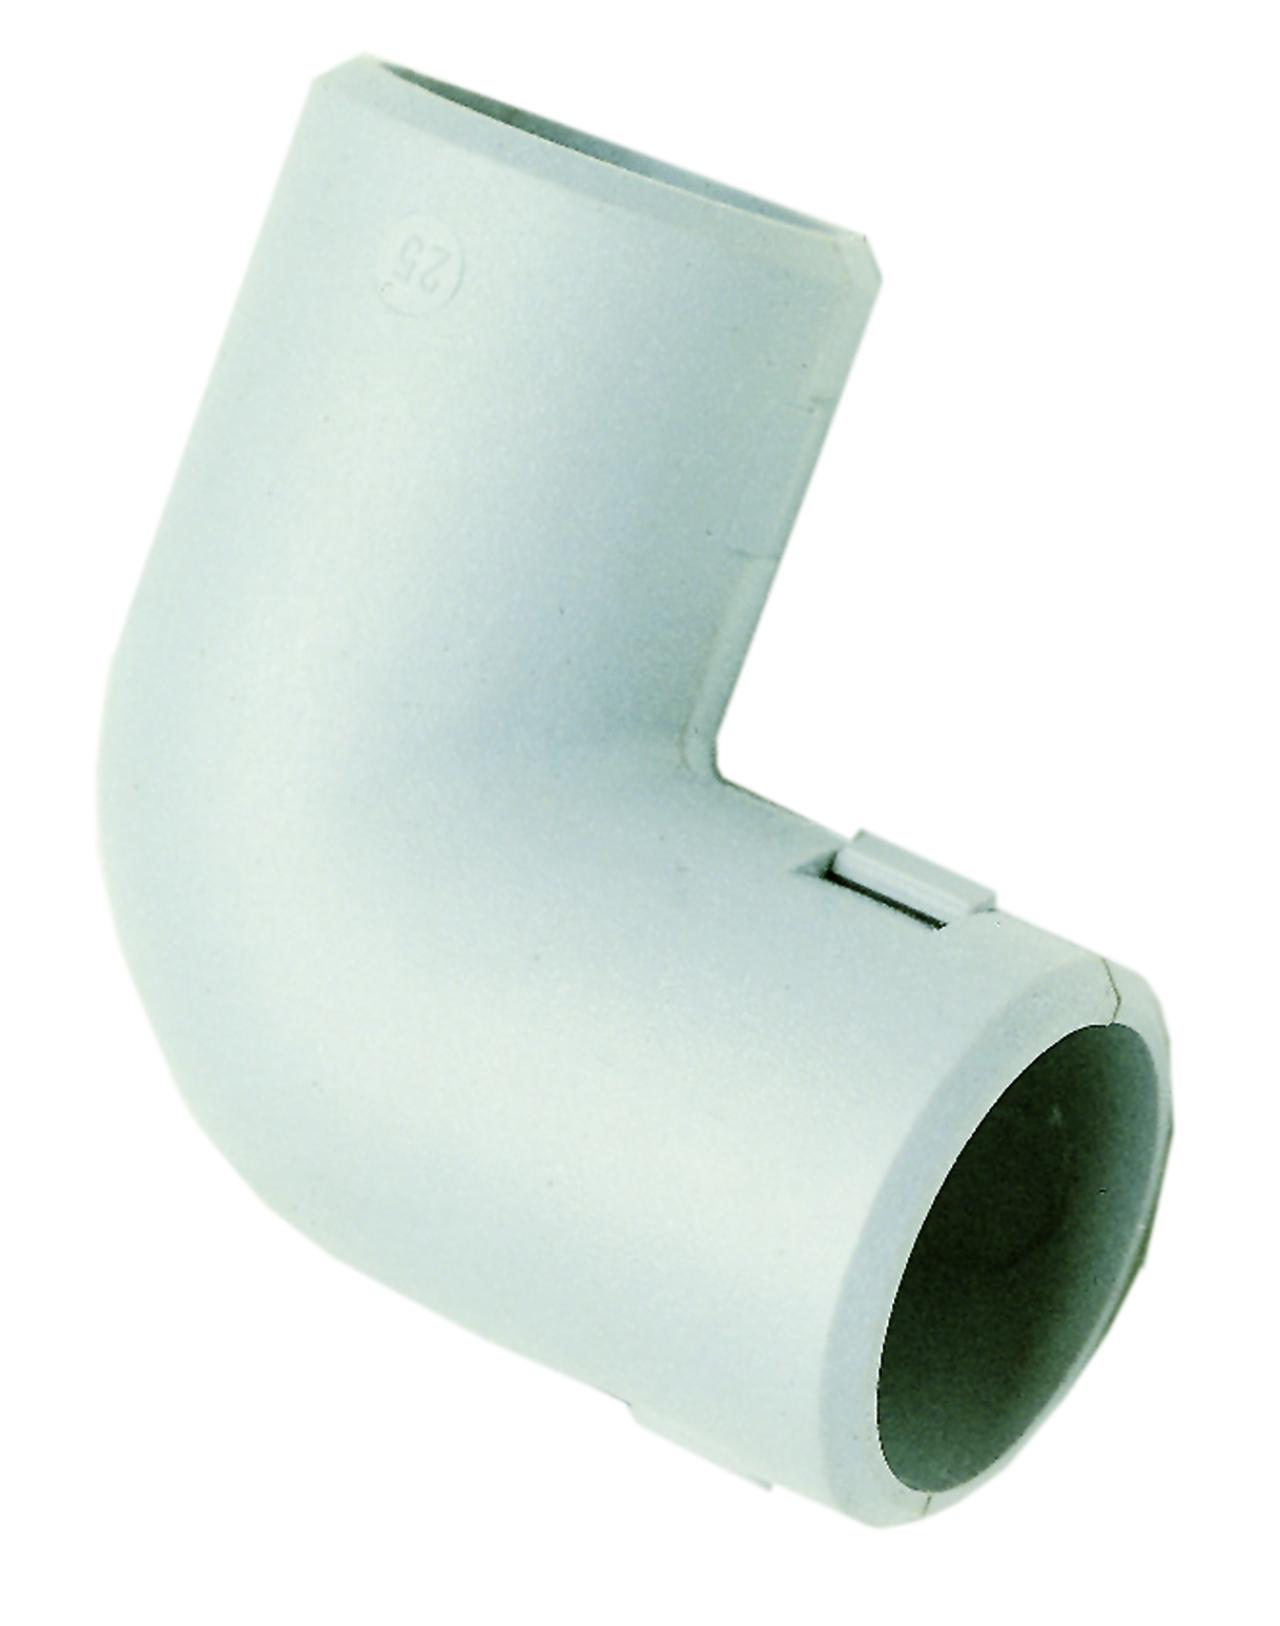 iboco 20086 coude flexible diam/ètre 20 irl